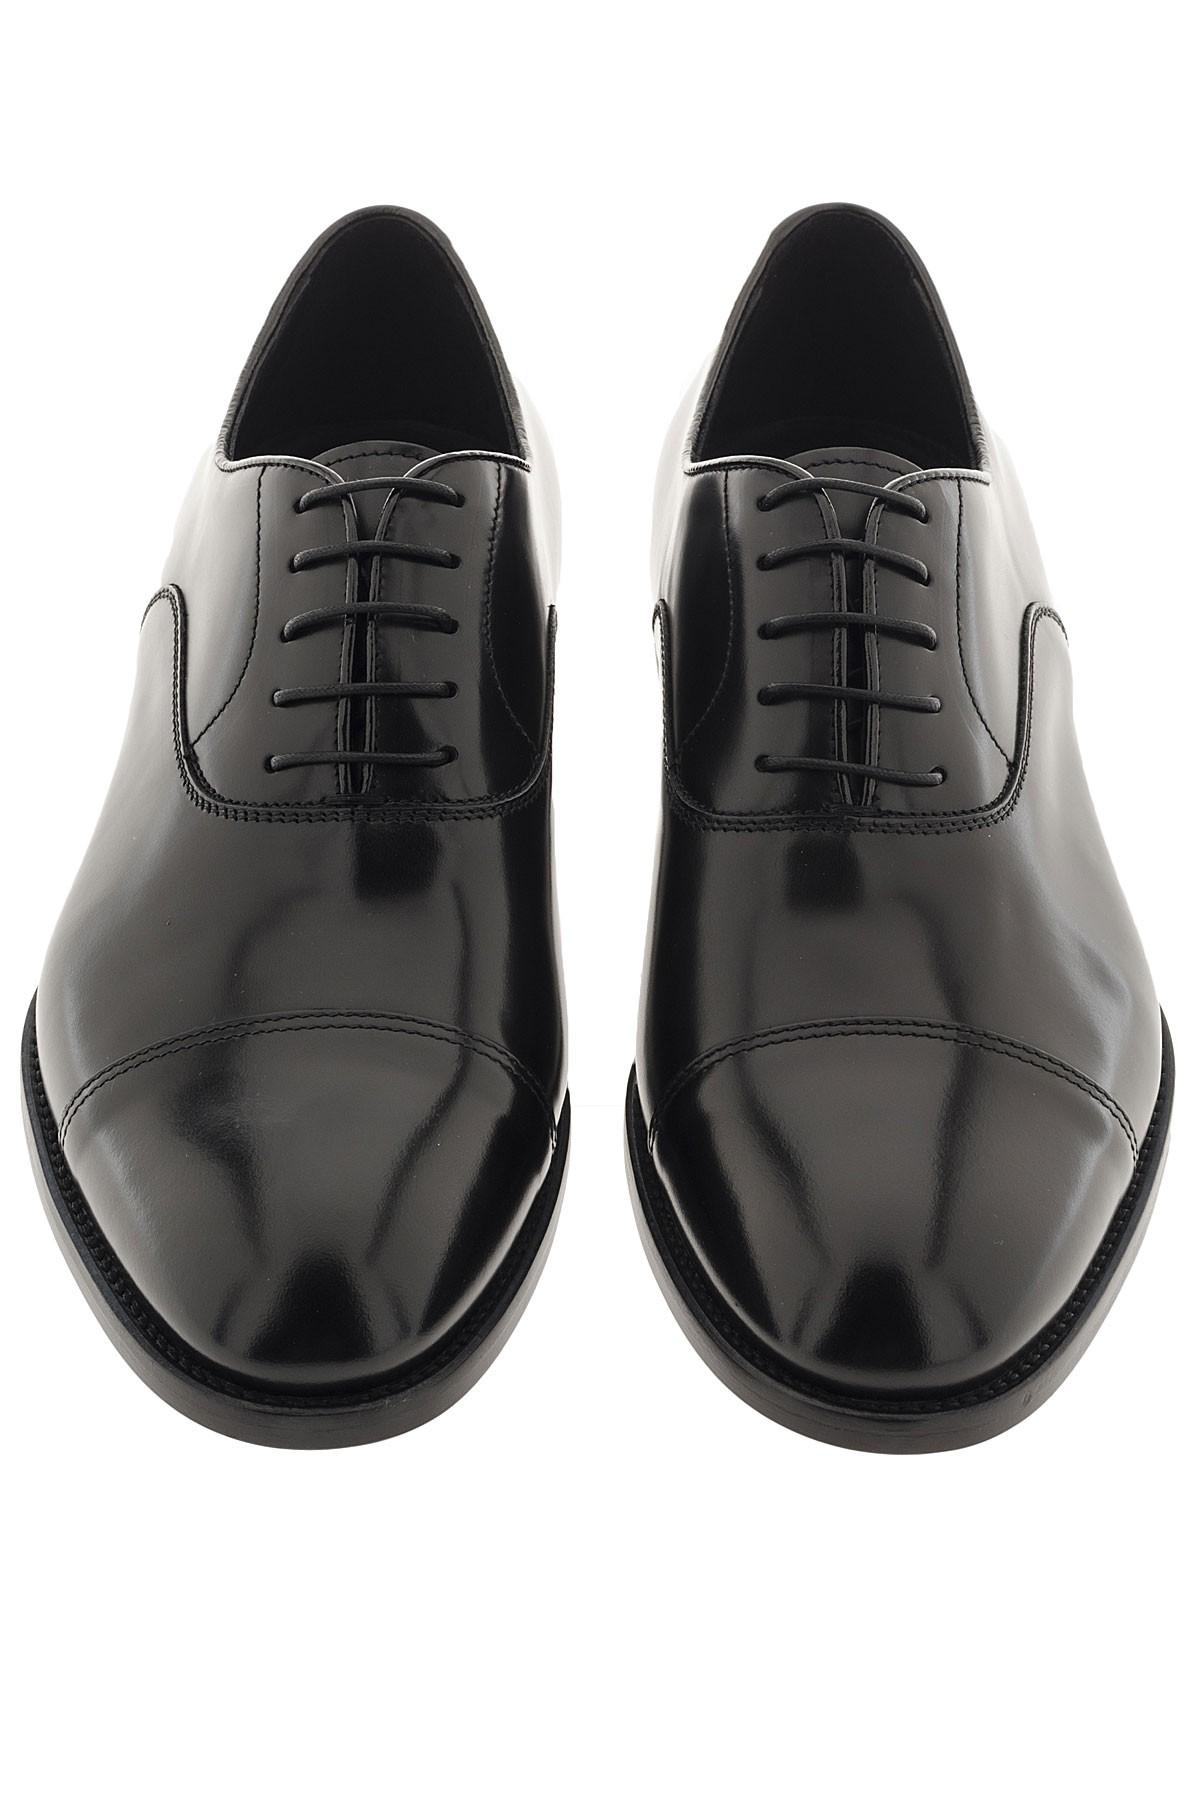 Scarpe Nere Matrimonio Uomo : Scarpe nere uomo adidas alte maschili